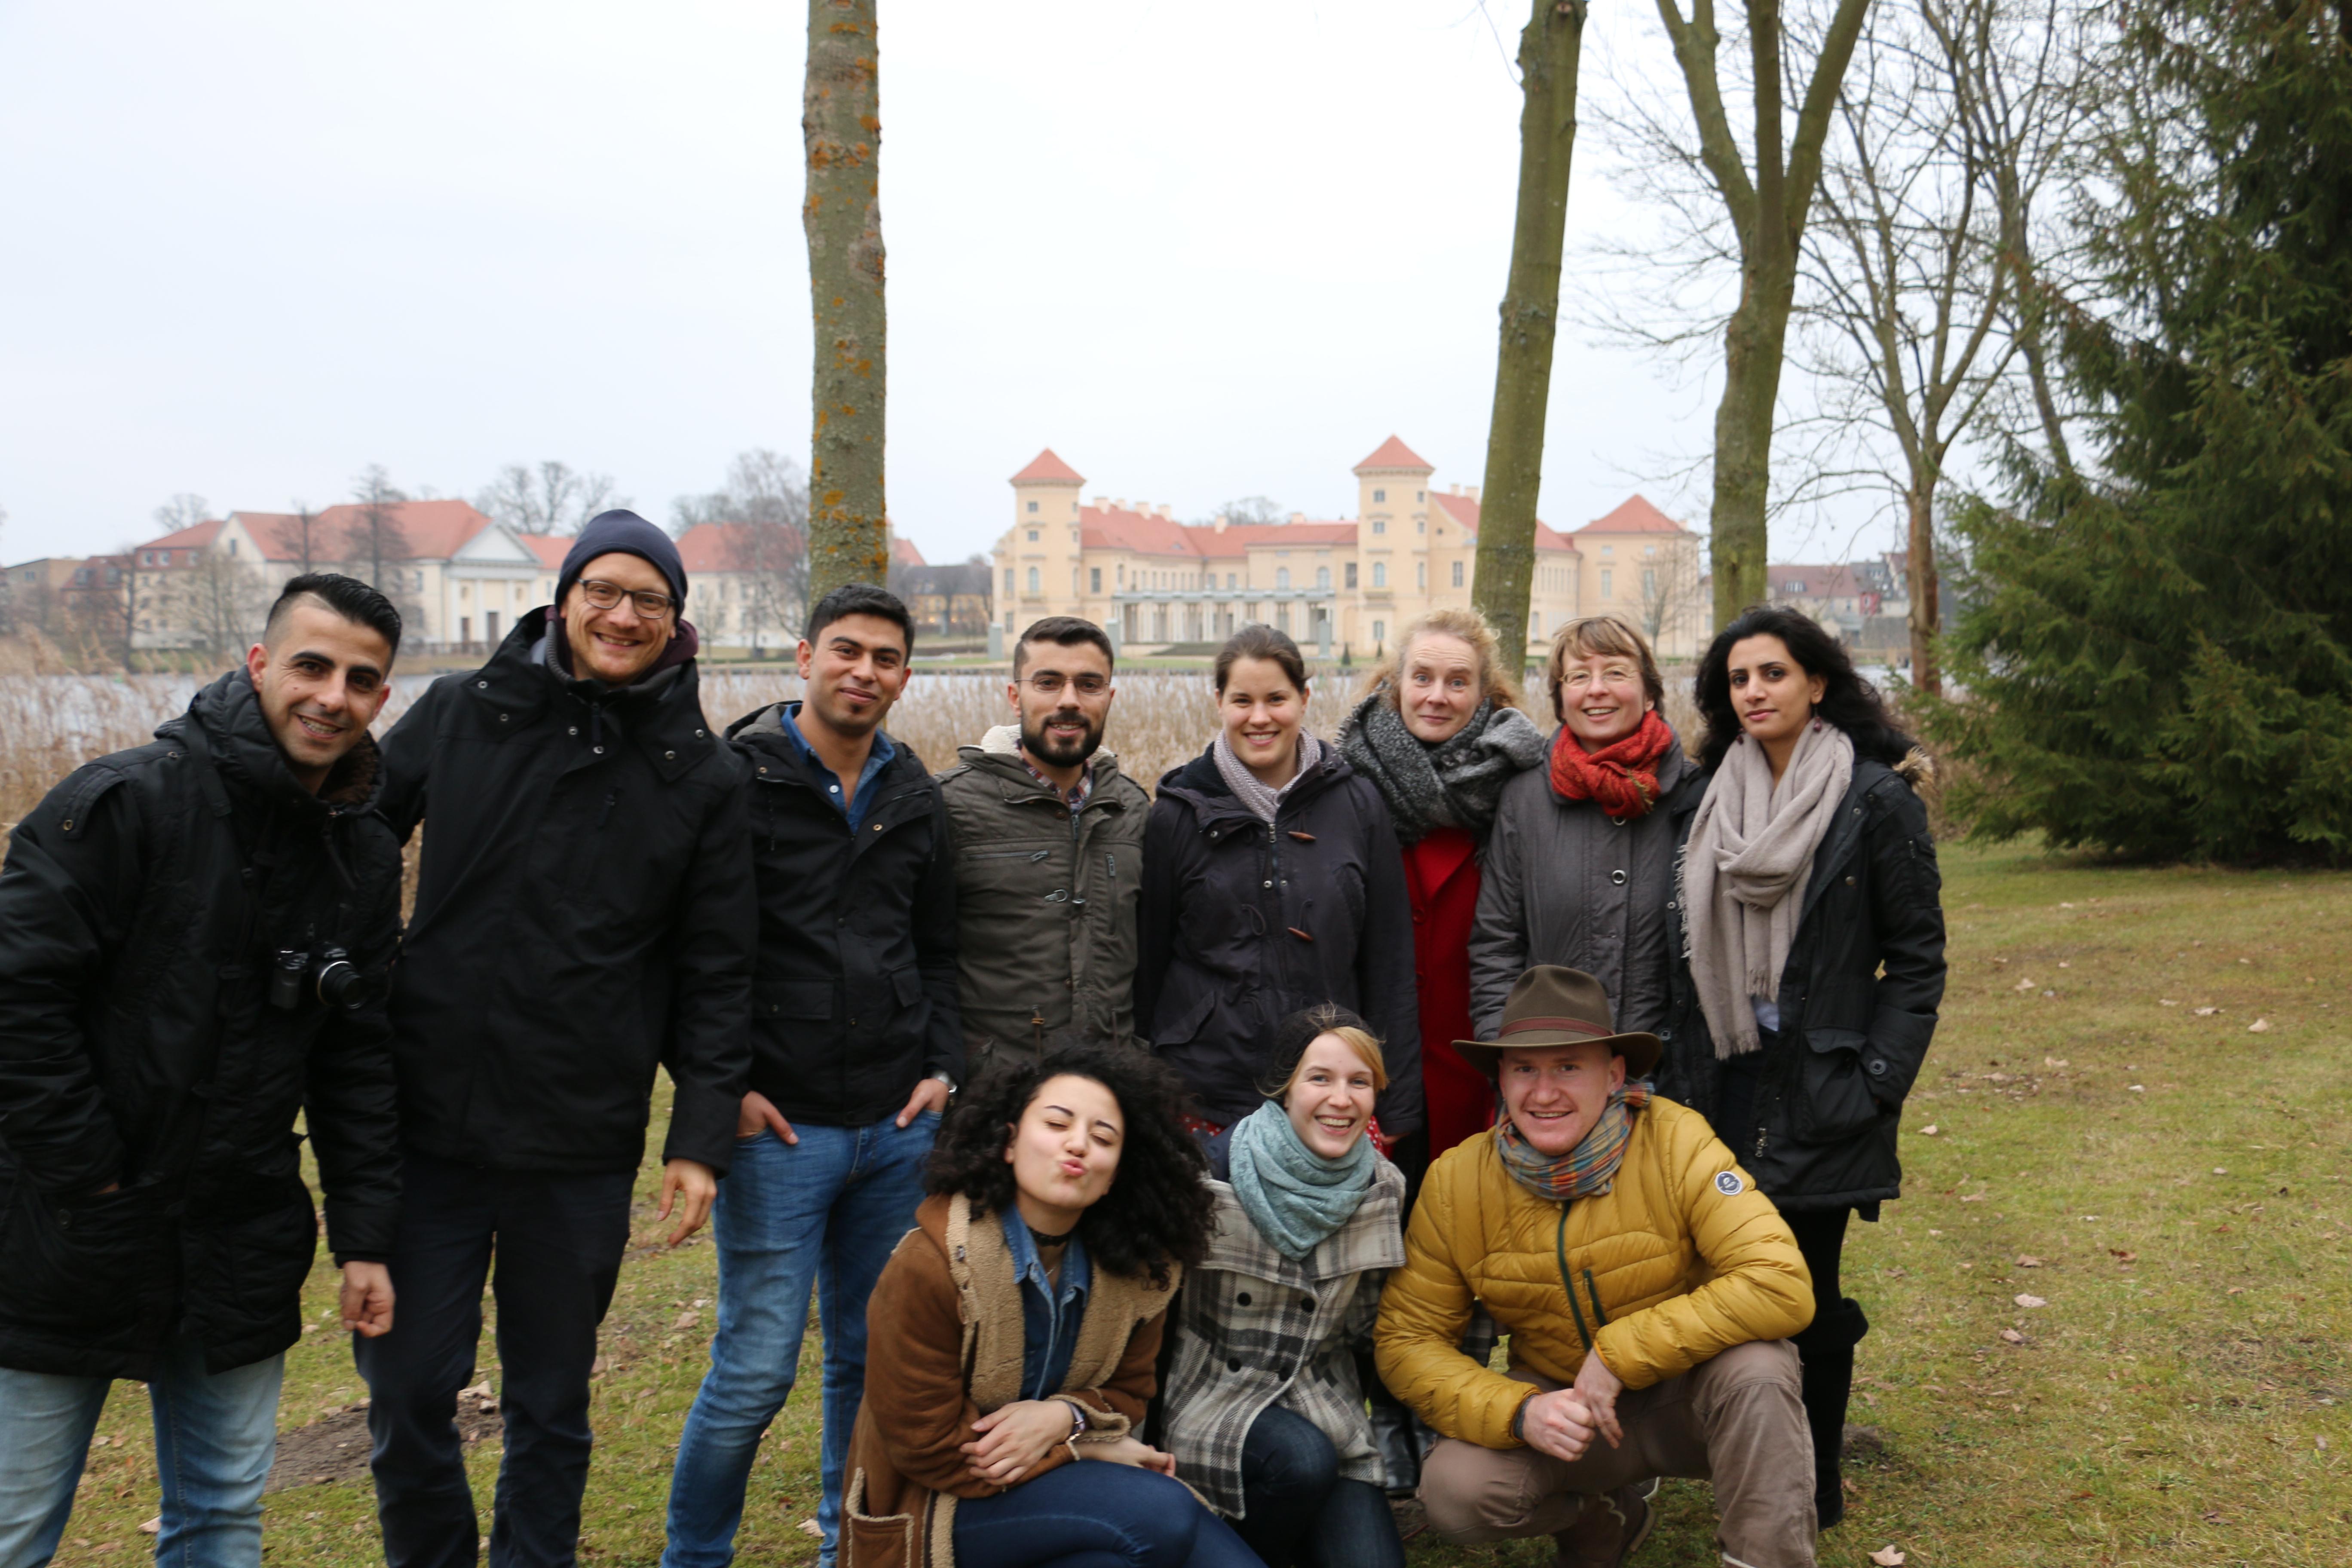 Spaziergang im Schlosspark